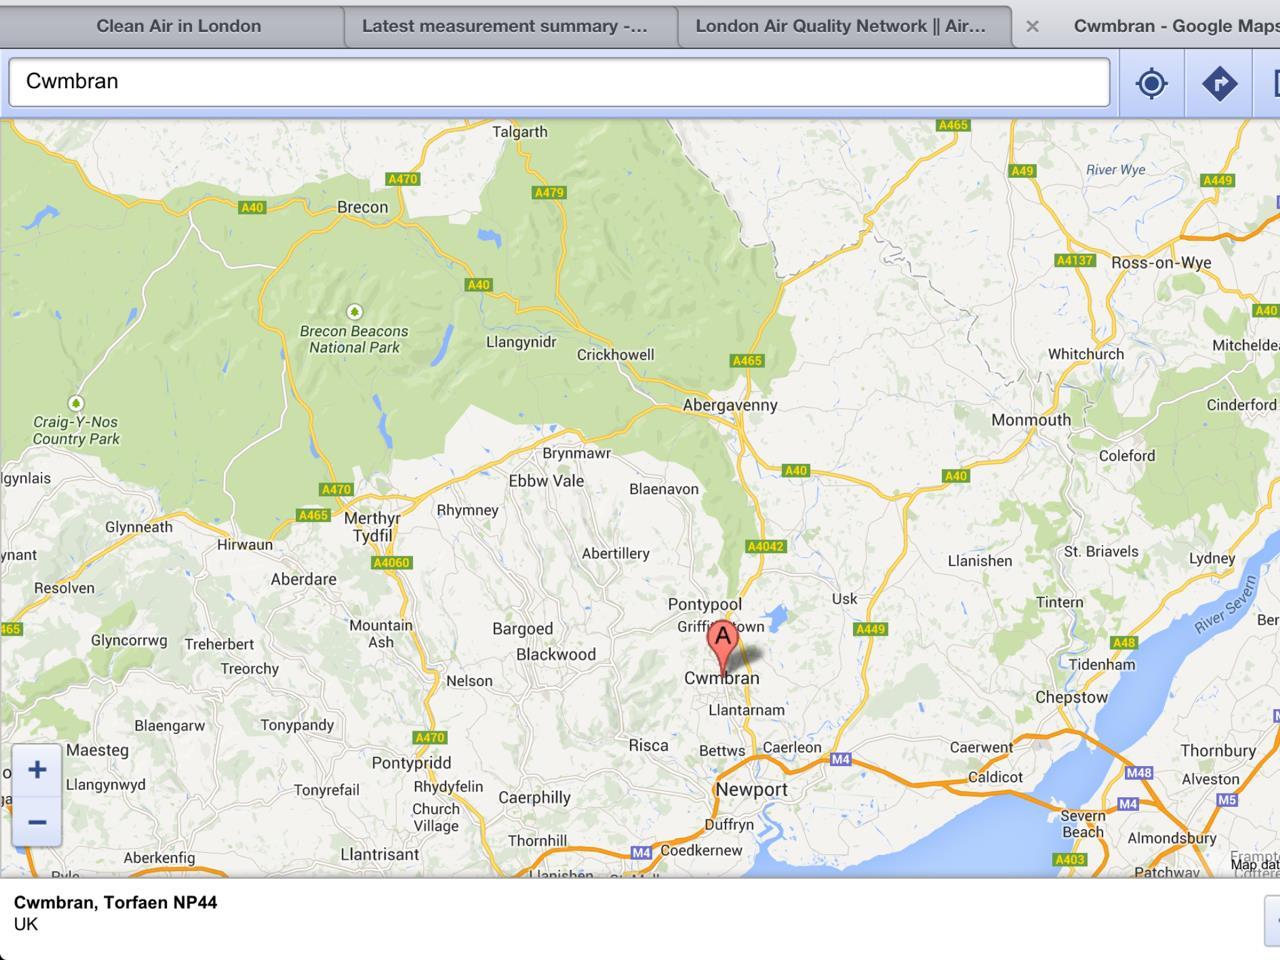 Exhibit 7 Google map showing Cwmbran